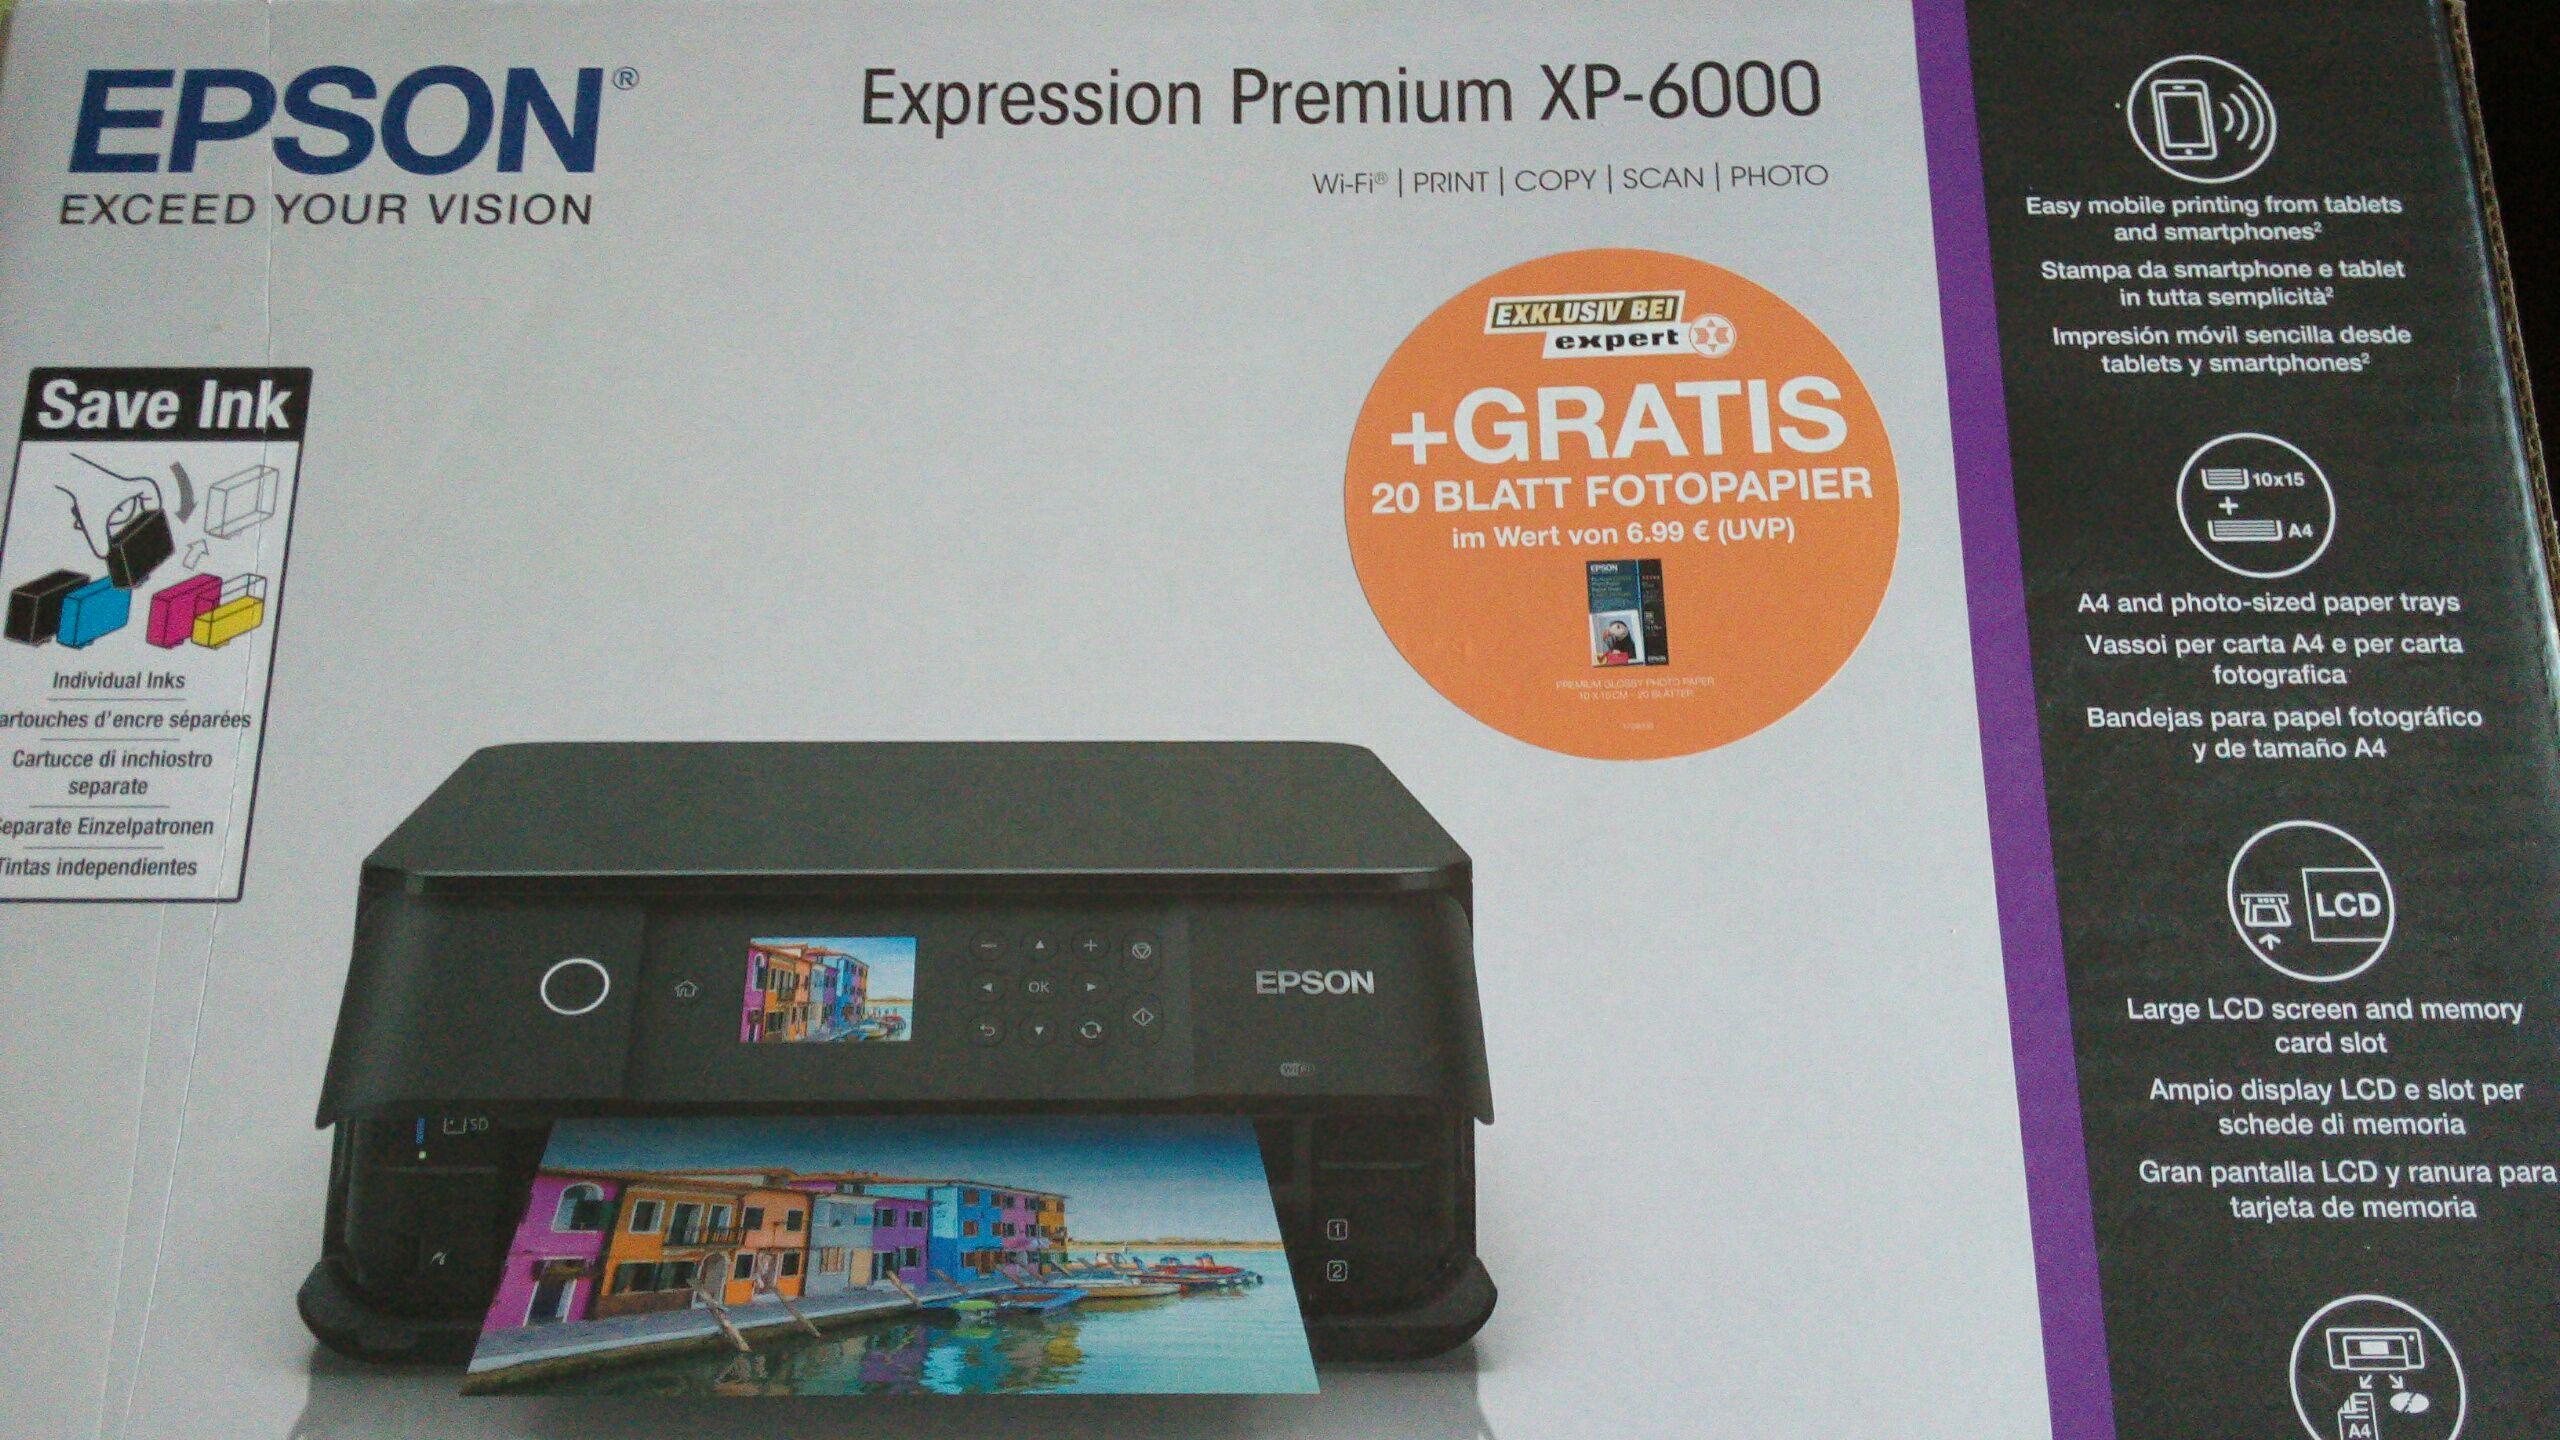 Epson XP 6000 + 20 Blatt Fotopapier